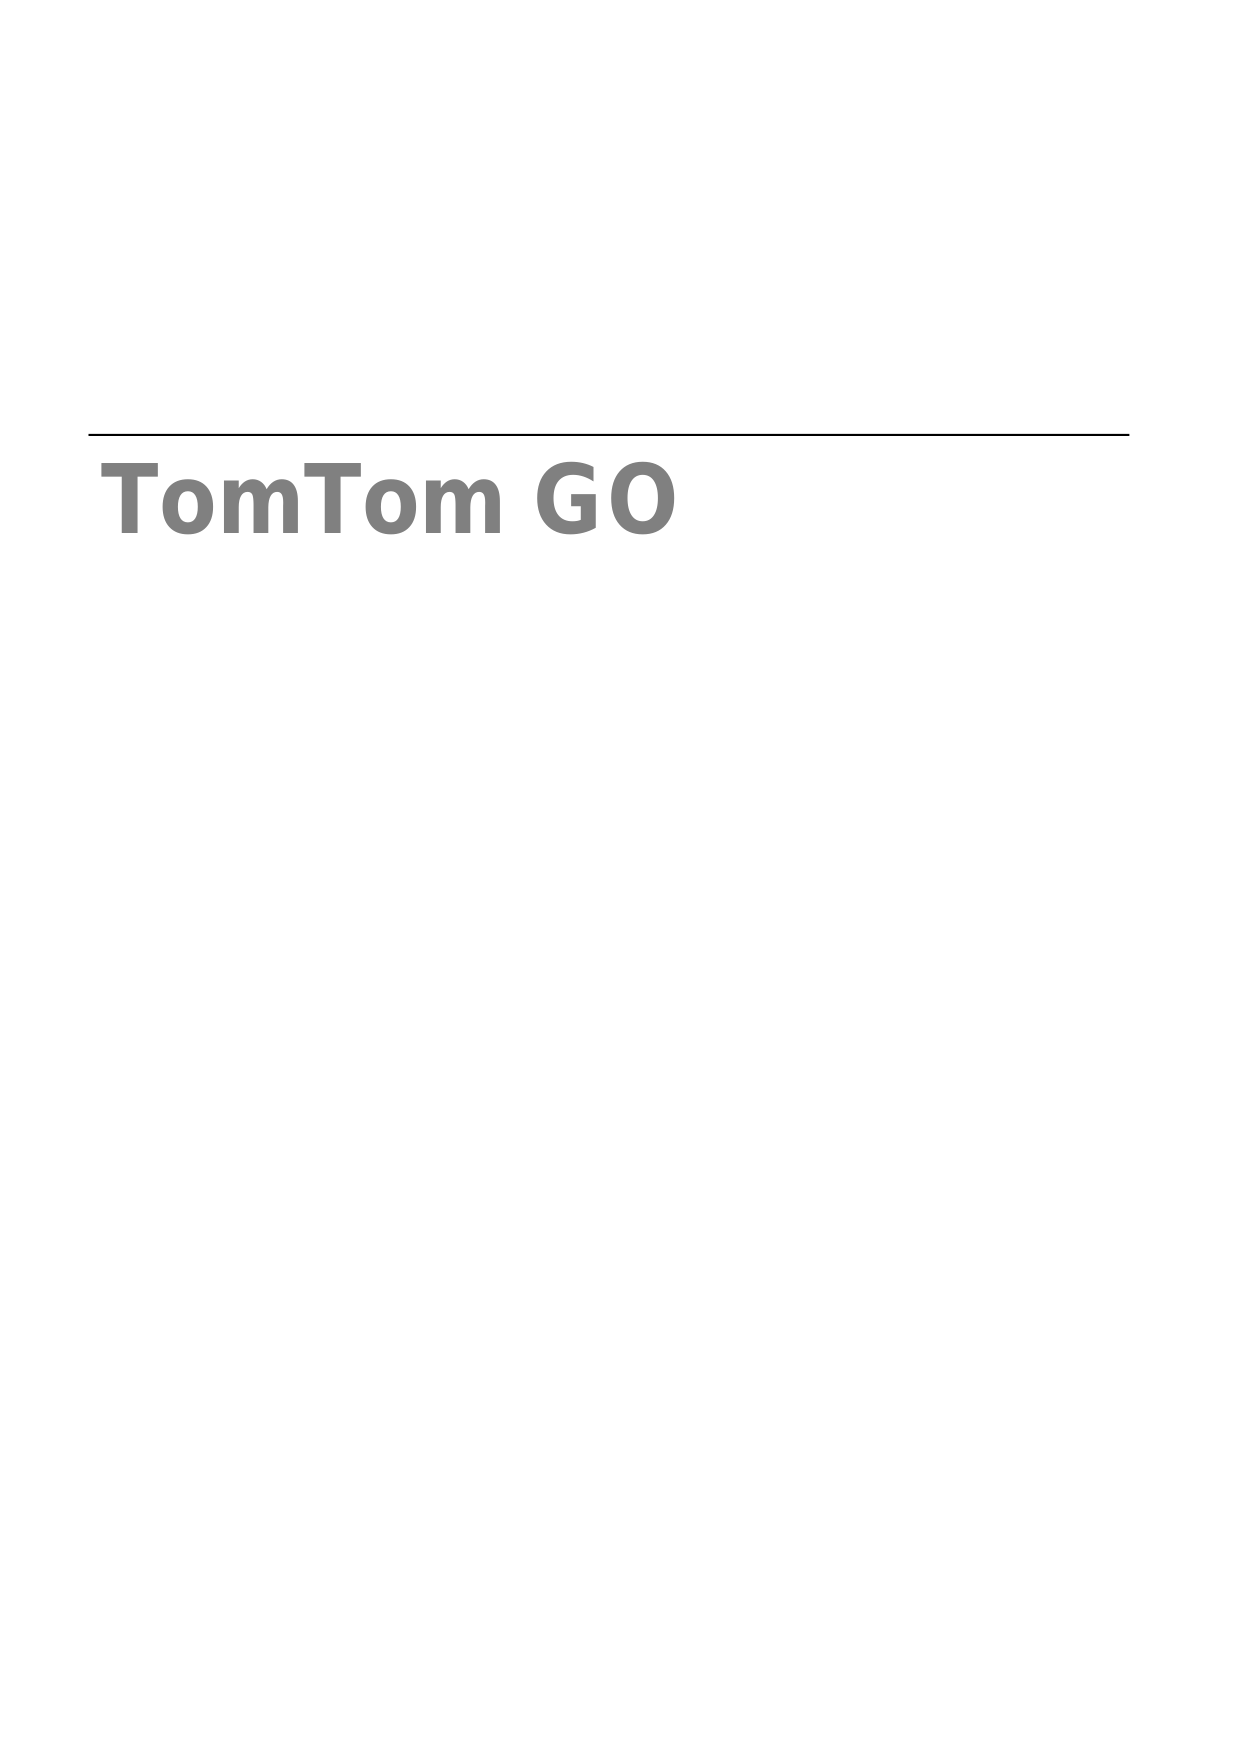 download free pdf for tomtom go 630 gps manual rh umlib com TomTom Update TomTom Navigation Accessories